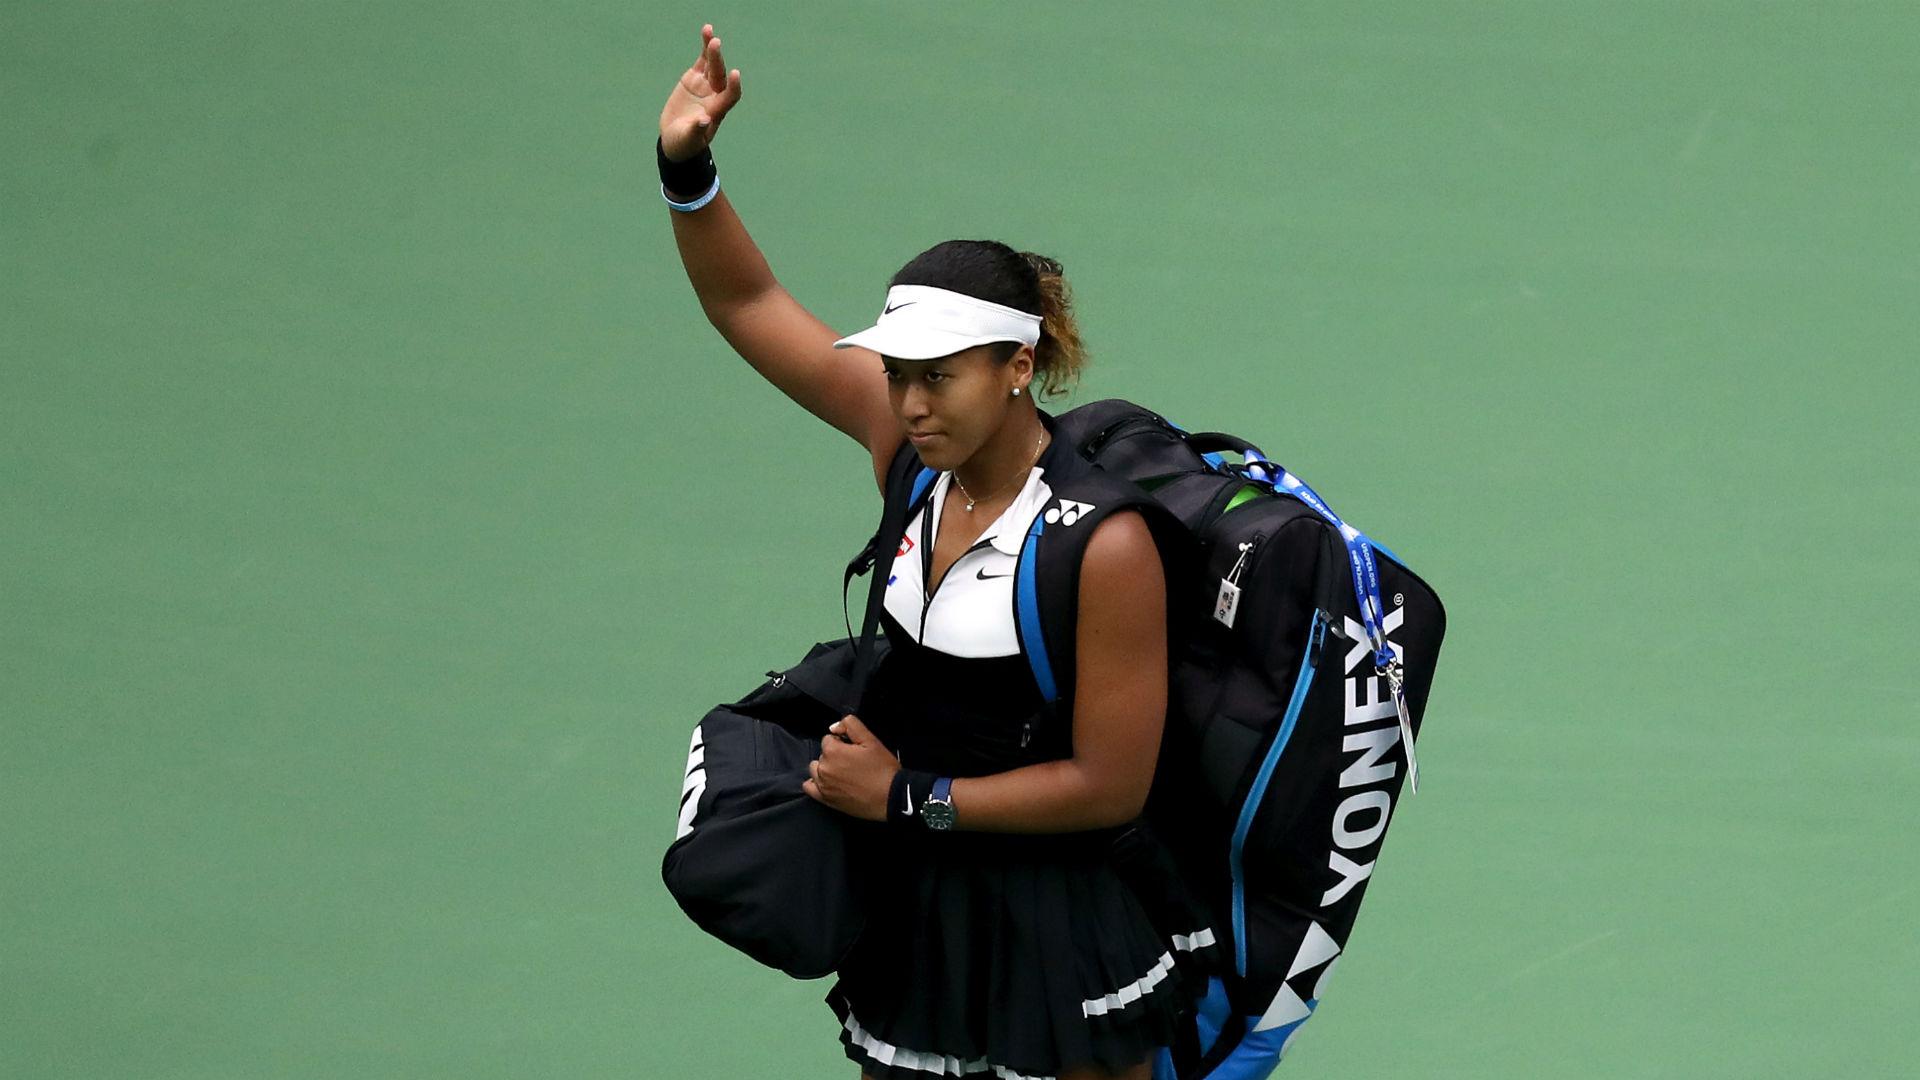 U.S. Open 2019: Naomi Osaka focusing on 'steps taken as a person' after Belinda Bencic defeat